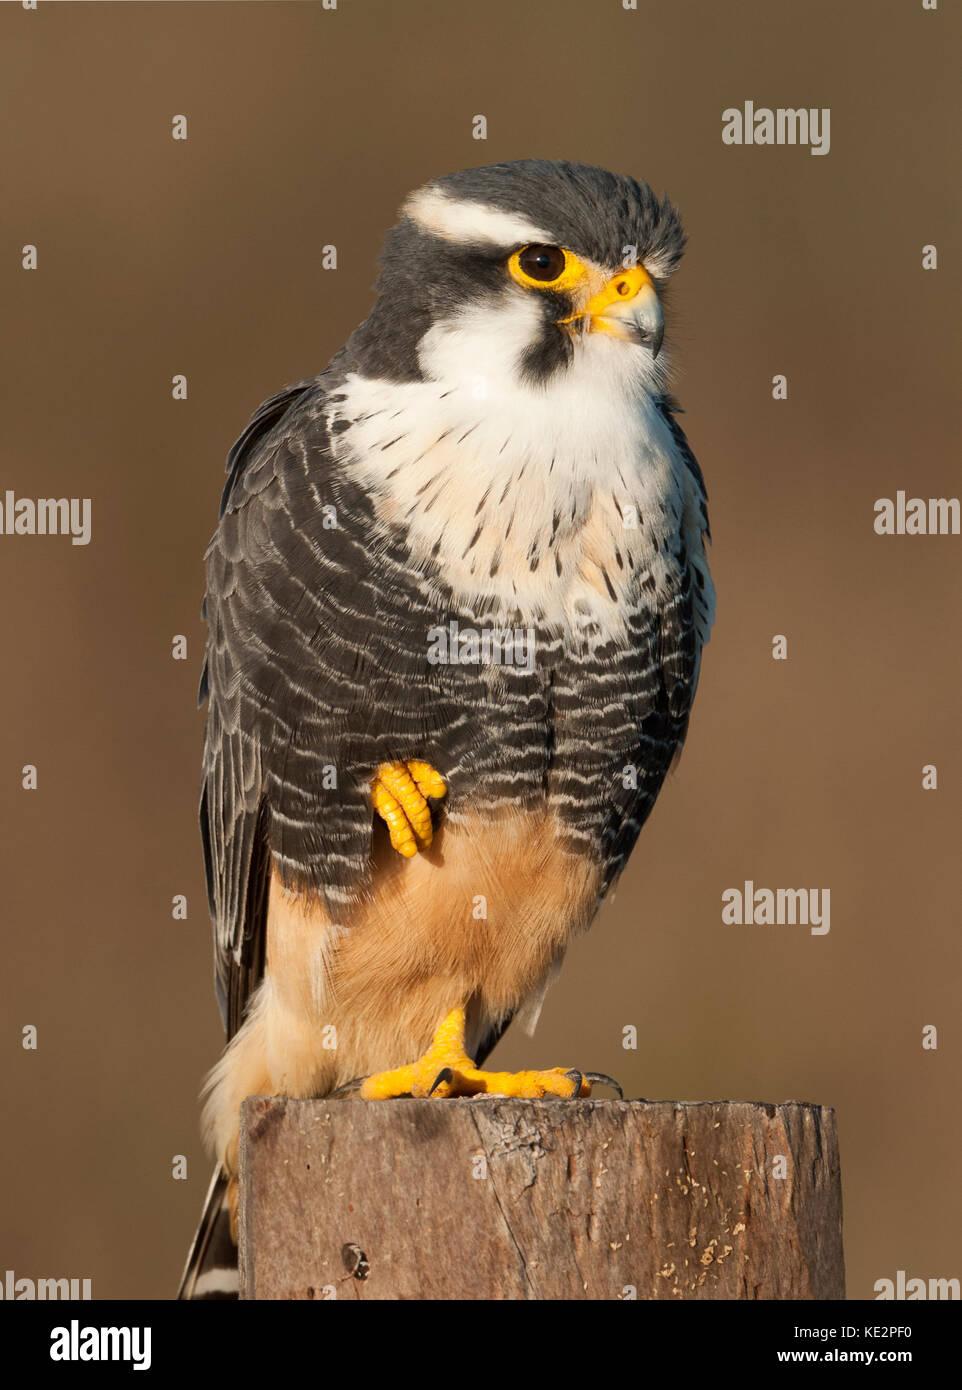 An Aplomado Falcon (Falco femoralis) from the Pantanal, Brazil - Stock Image